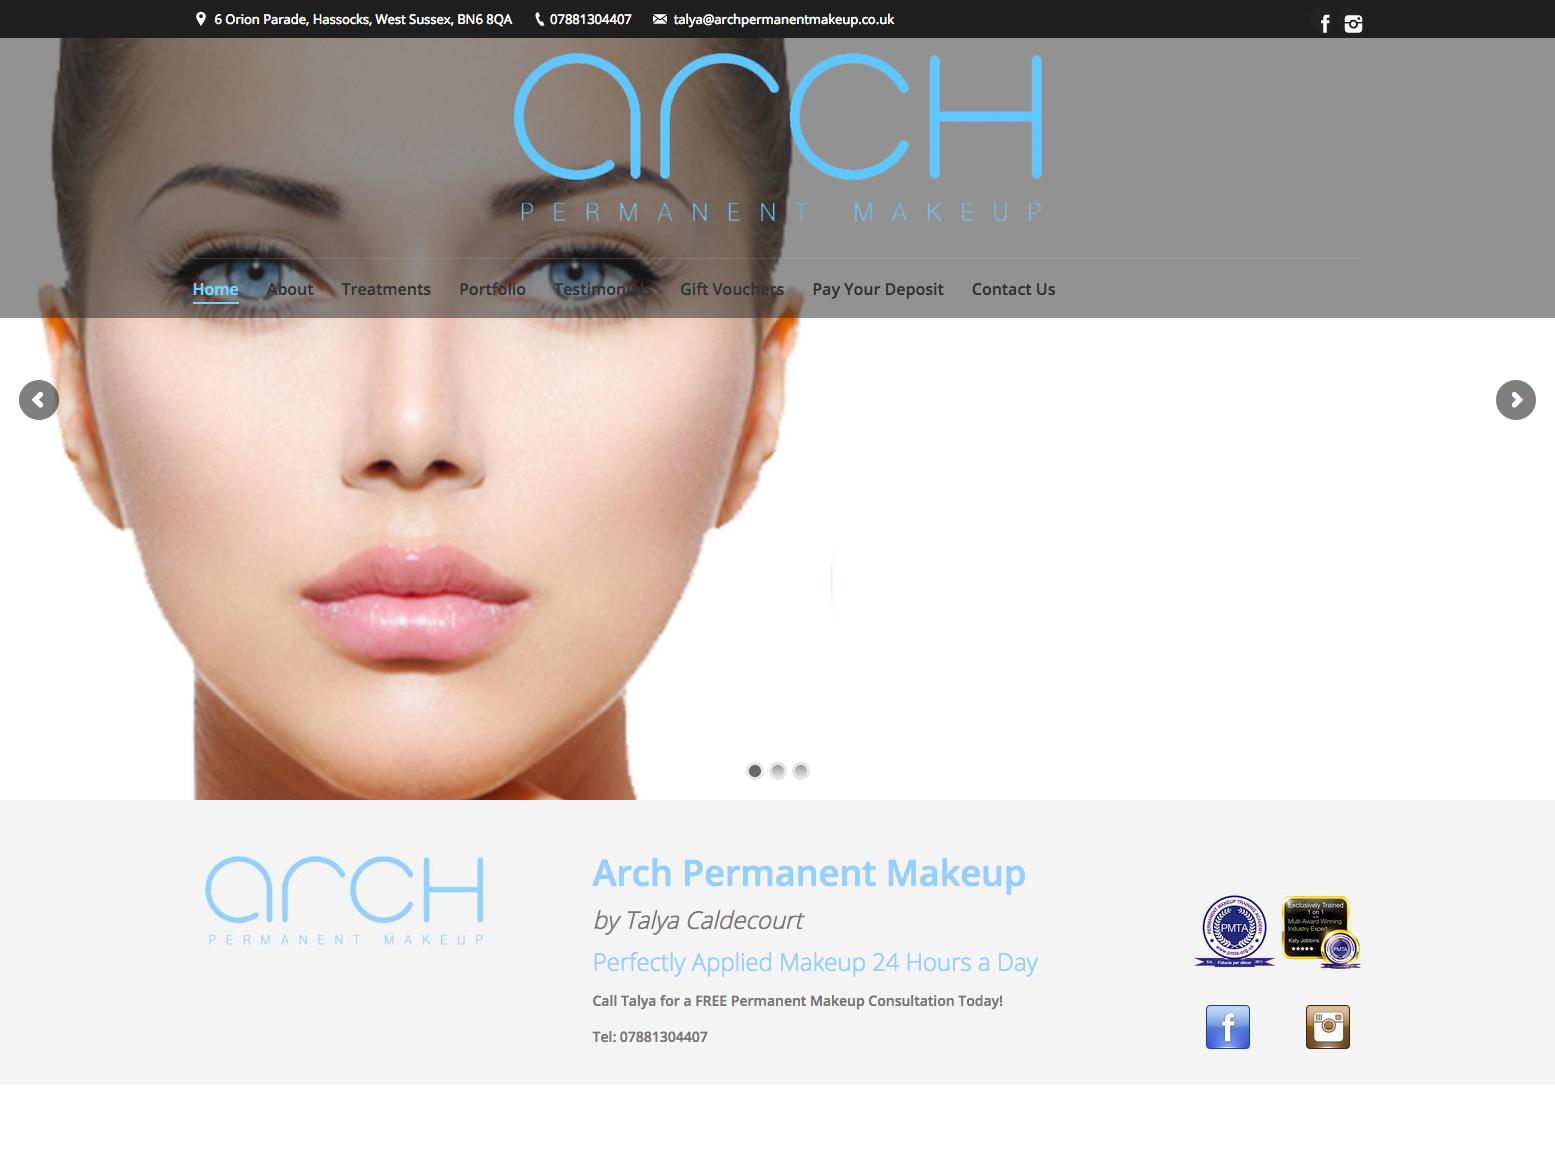 Arch Permanent Makeup